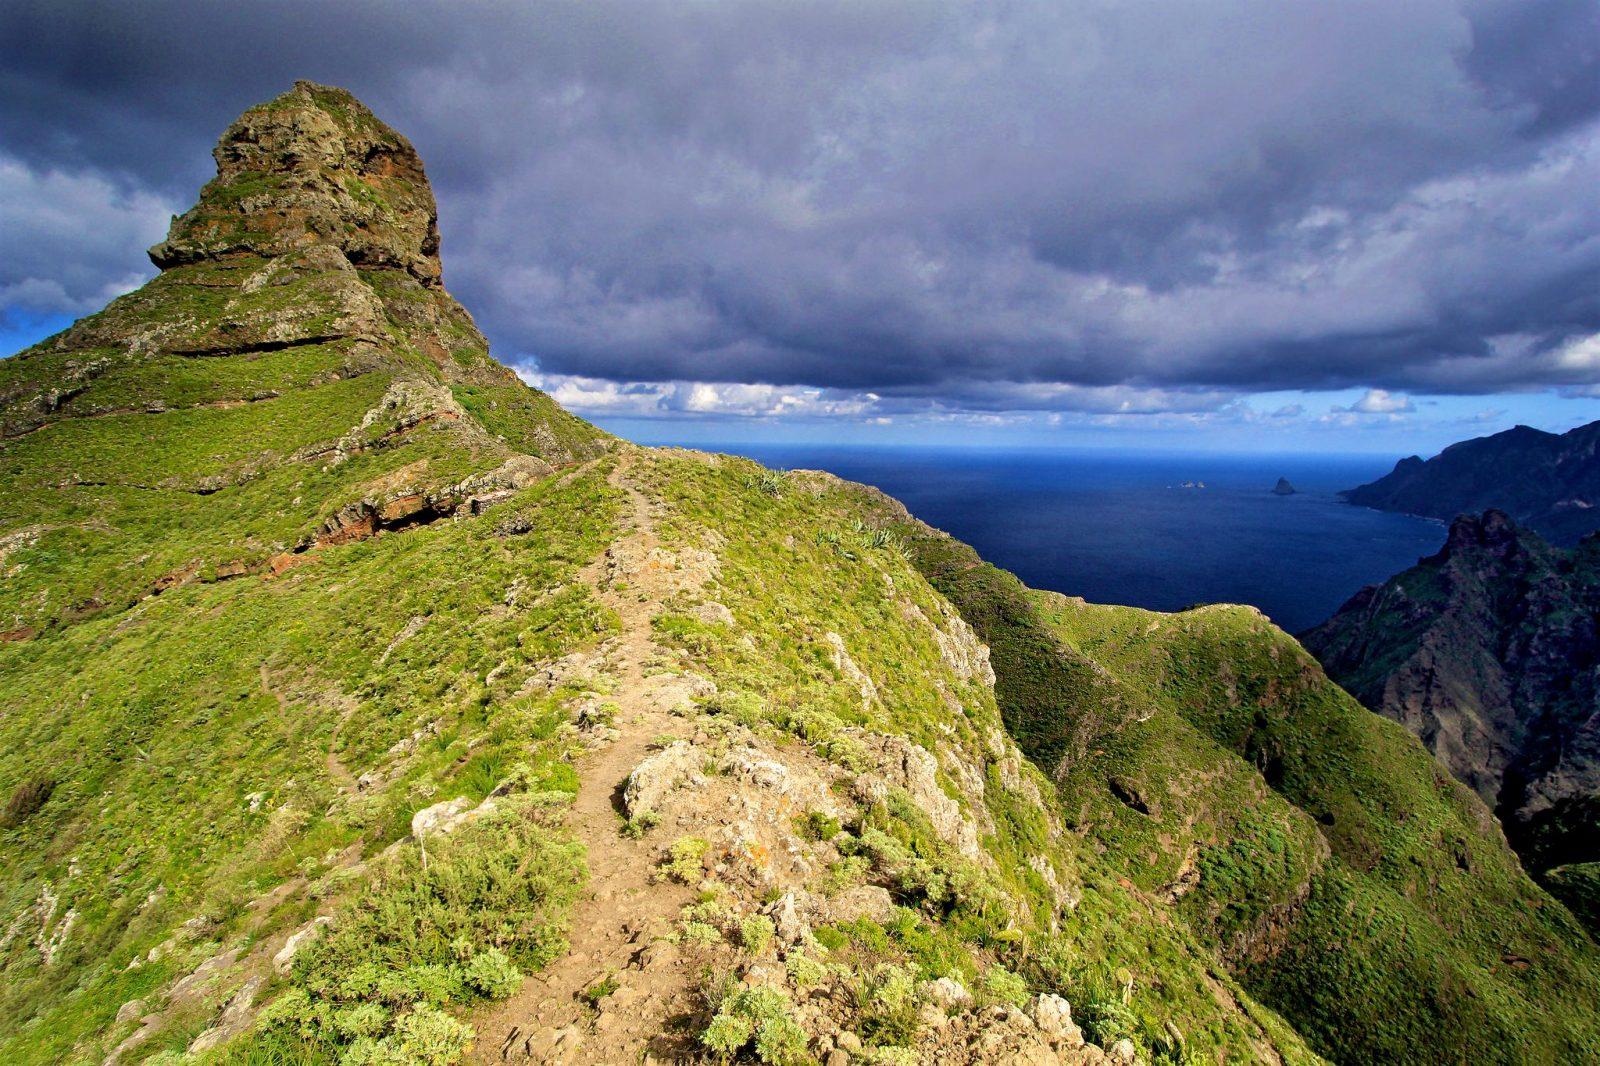 Гора Роке де Таборно (фото: Marcus Eich)